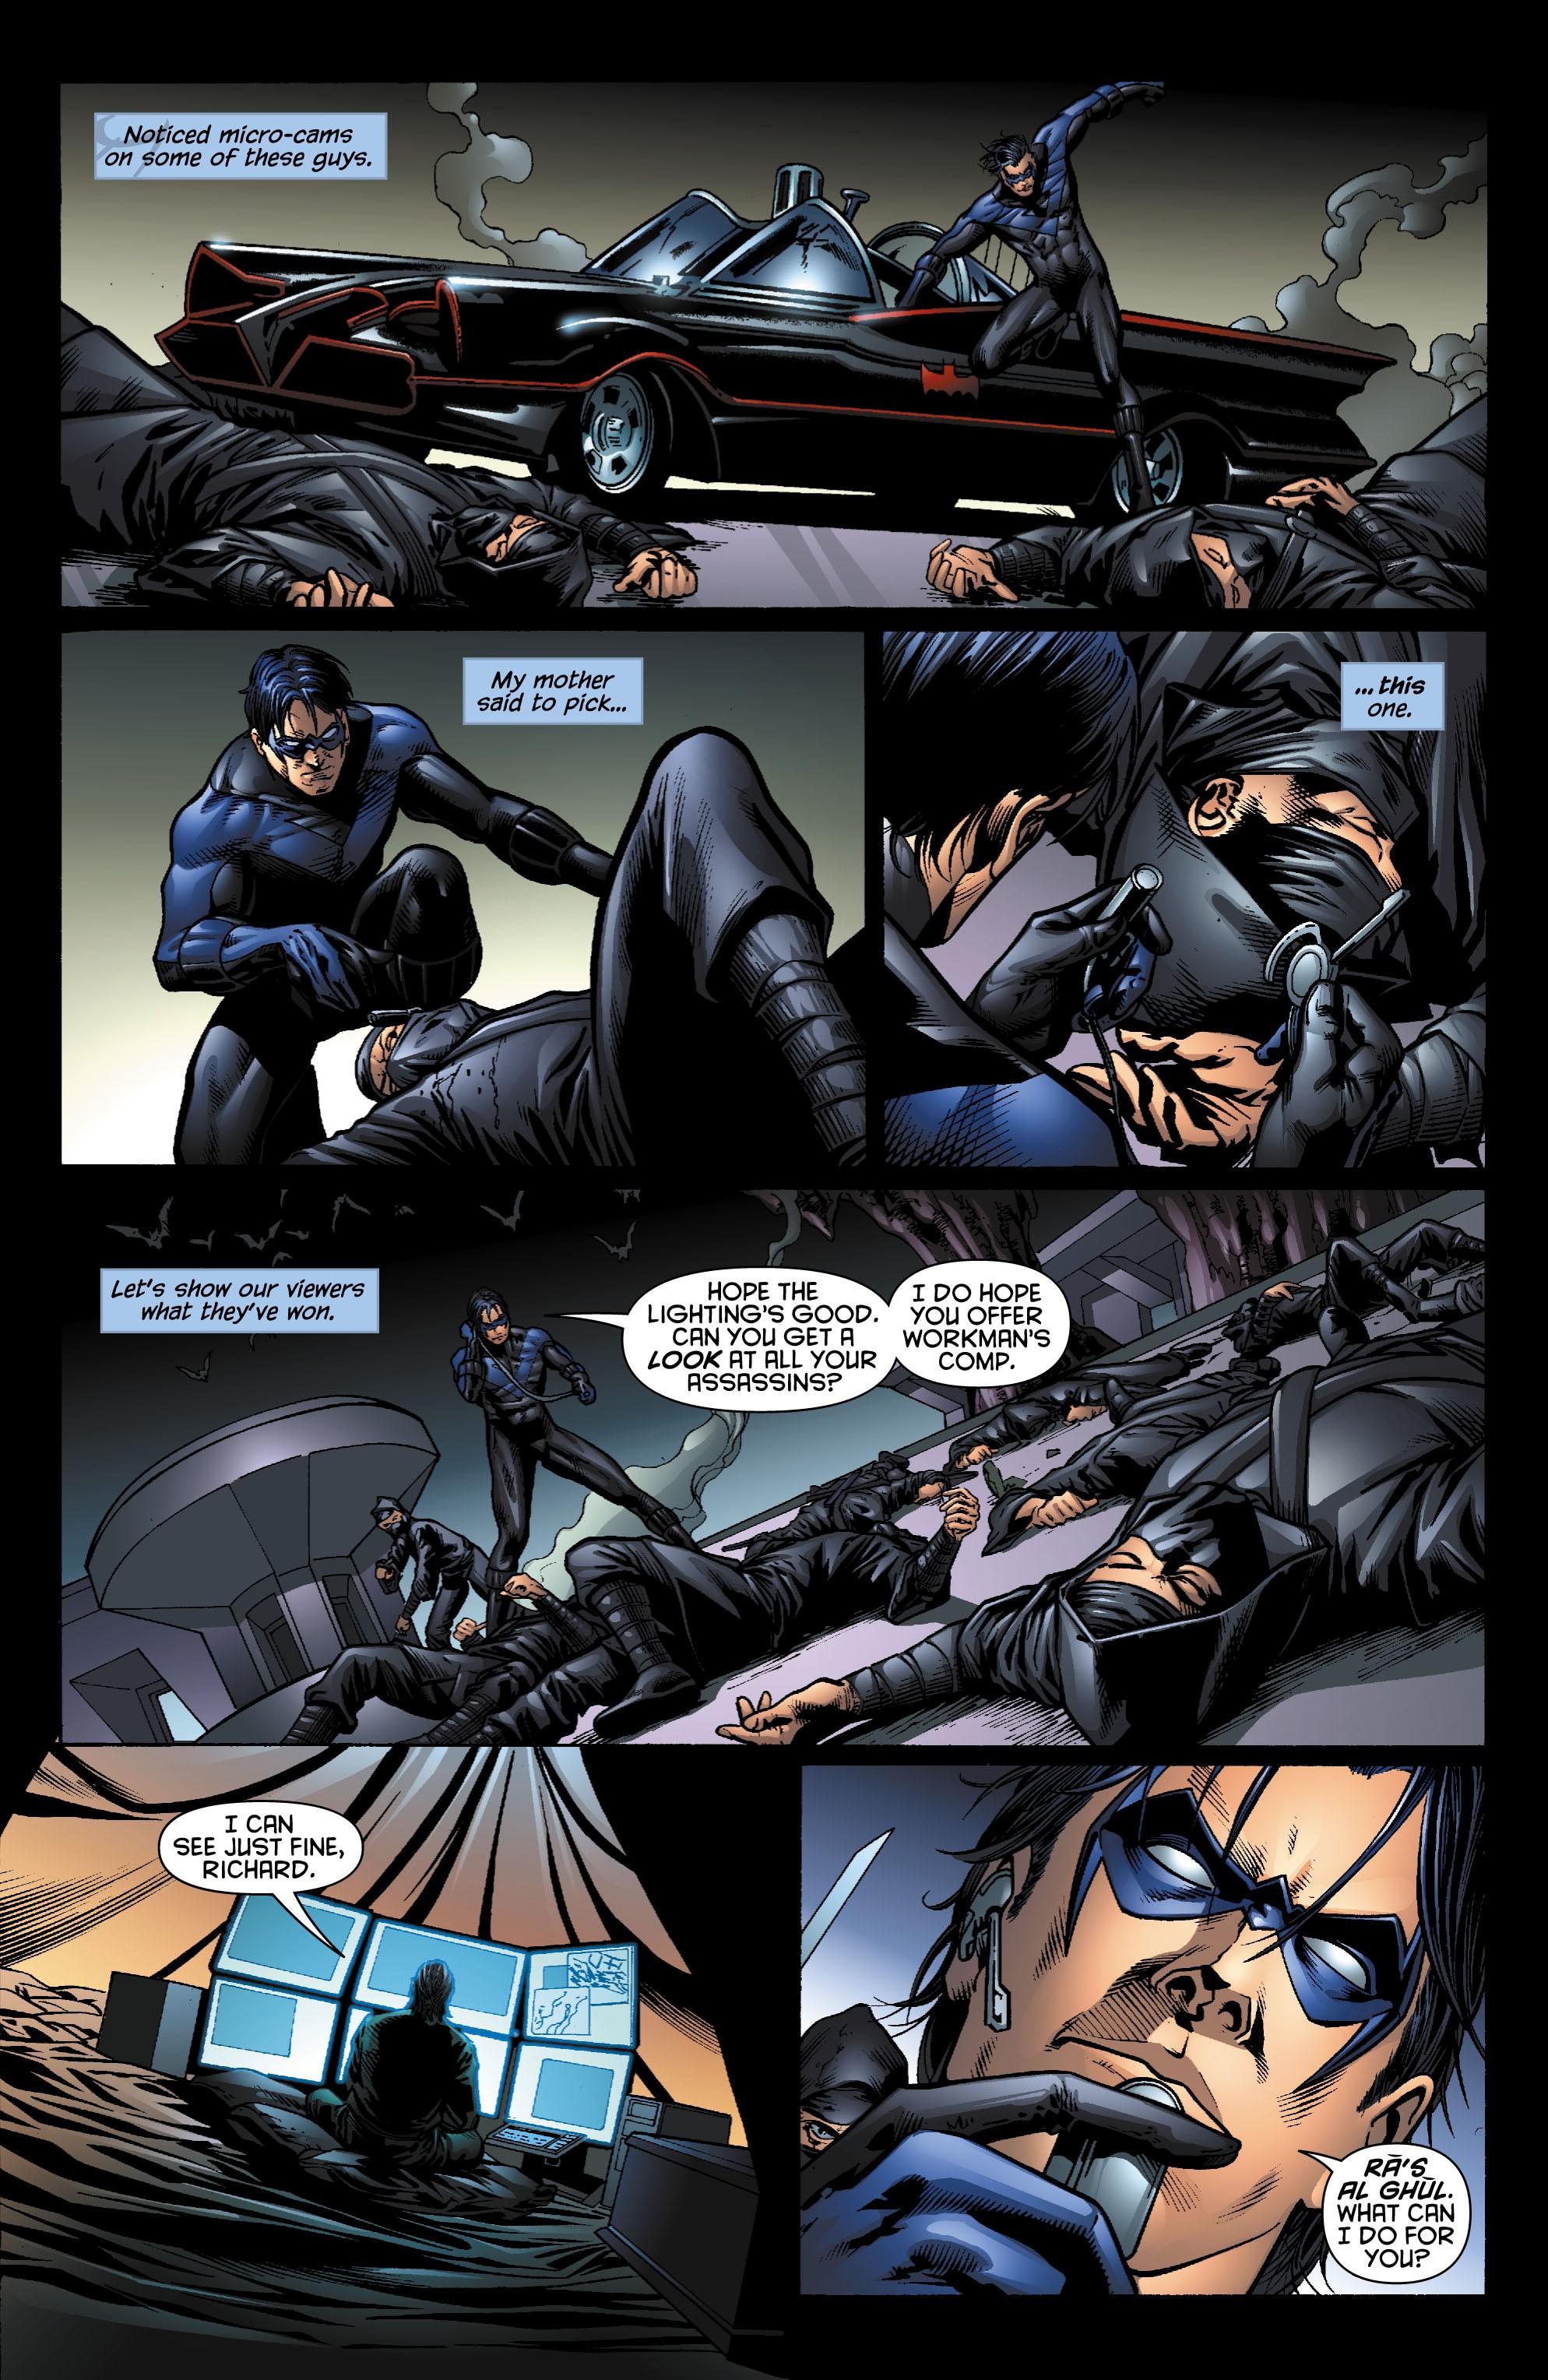 Nightwing (1996) chap 152 pic 11